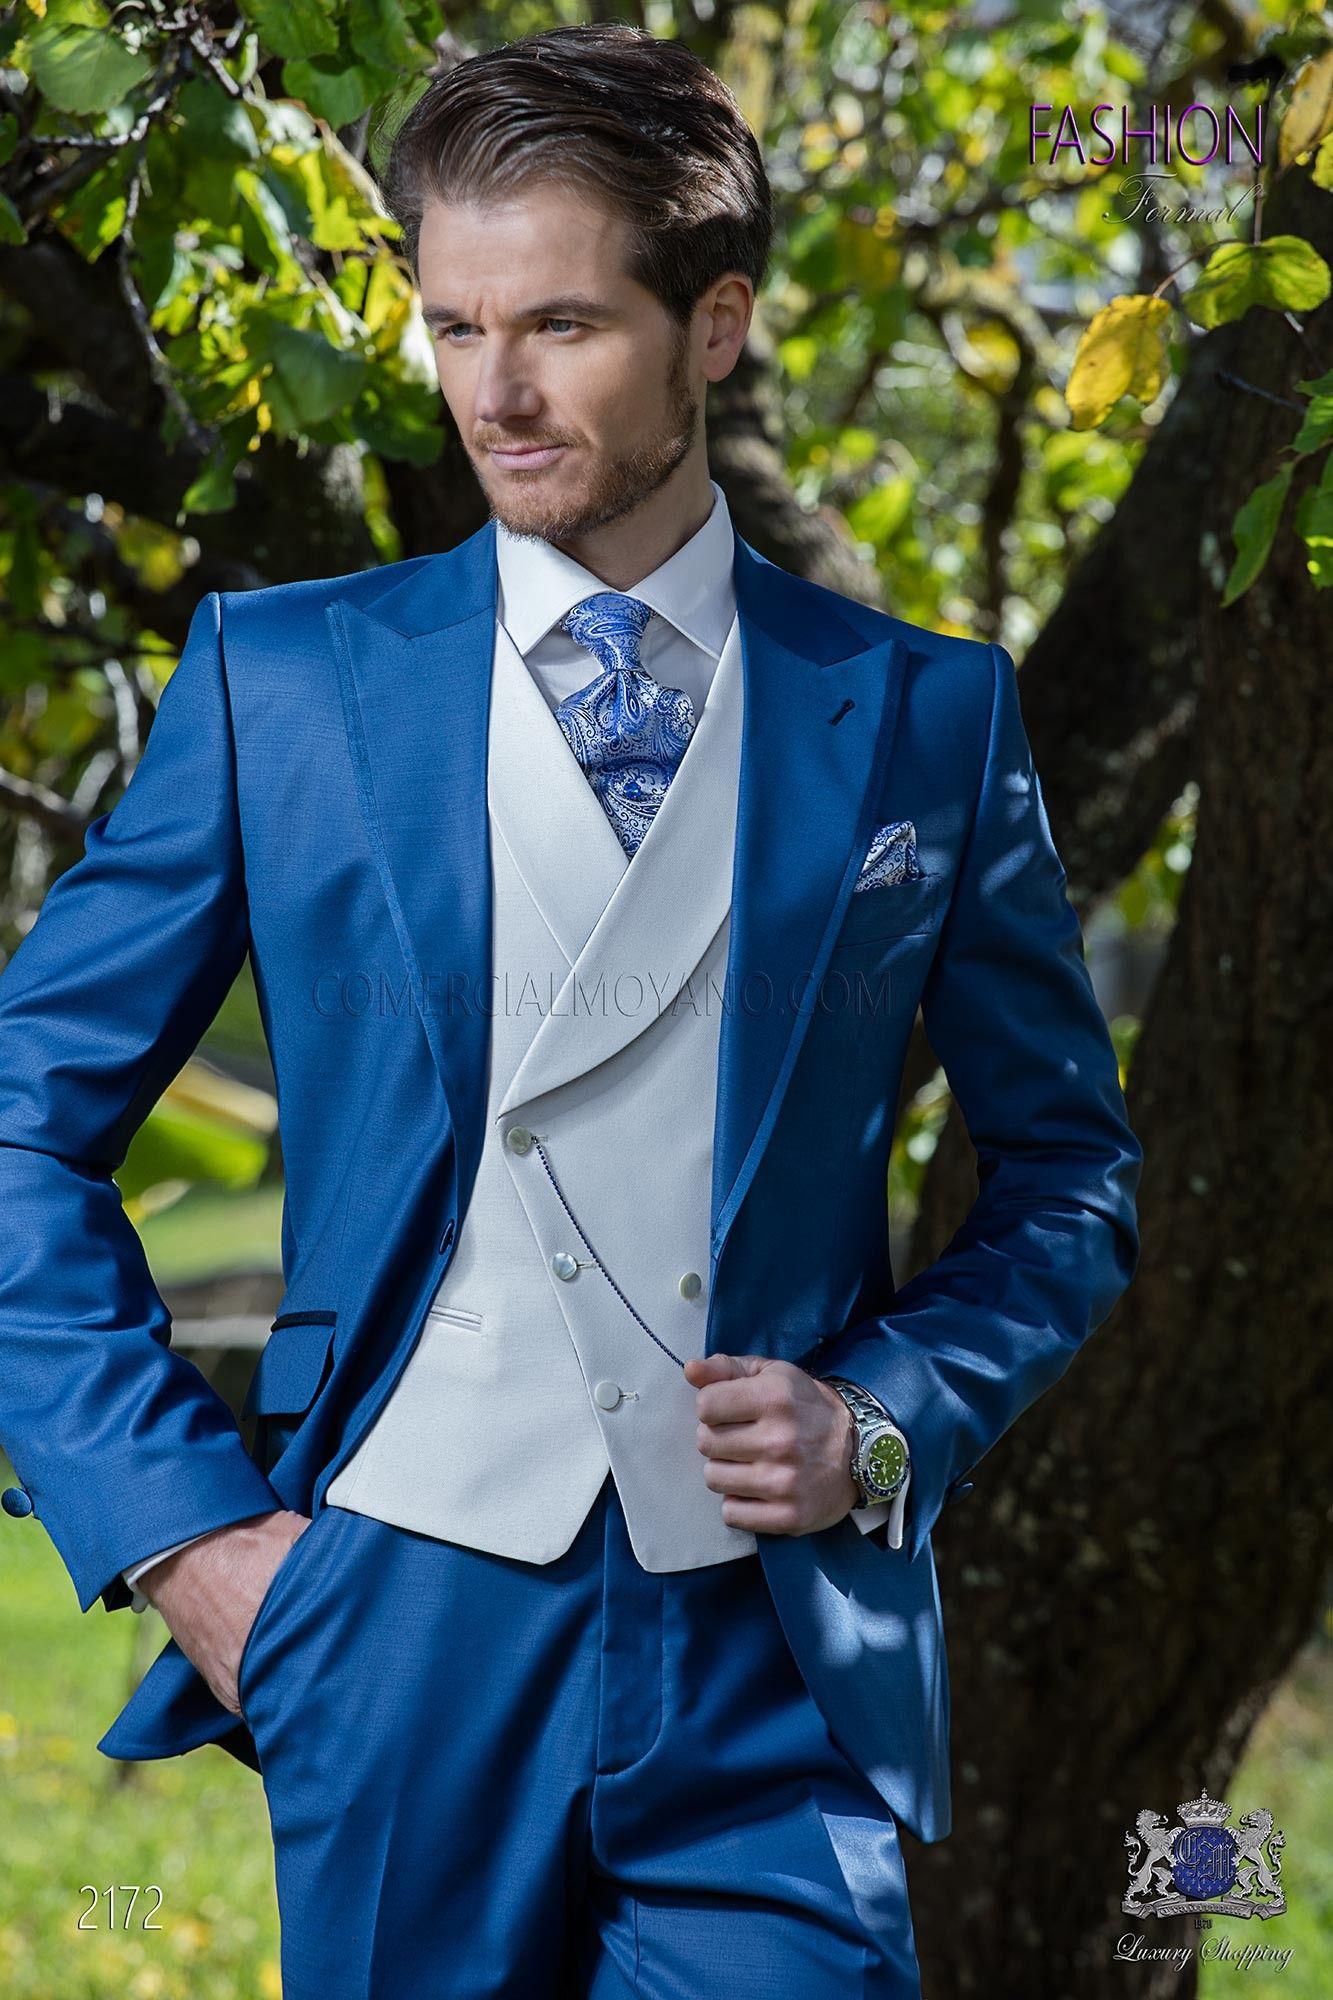 Costume de mariage bleu royal en 2019  e918efedc7b